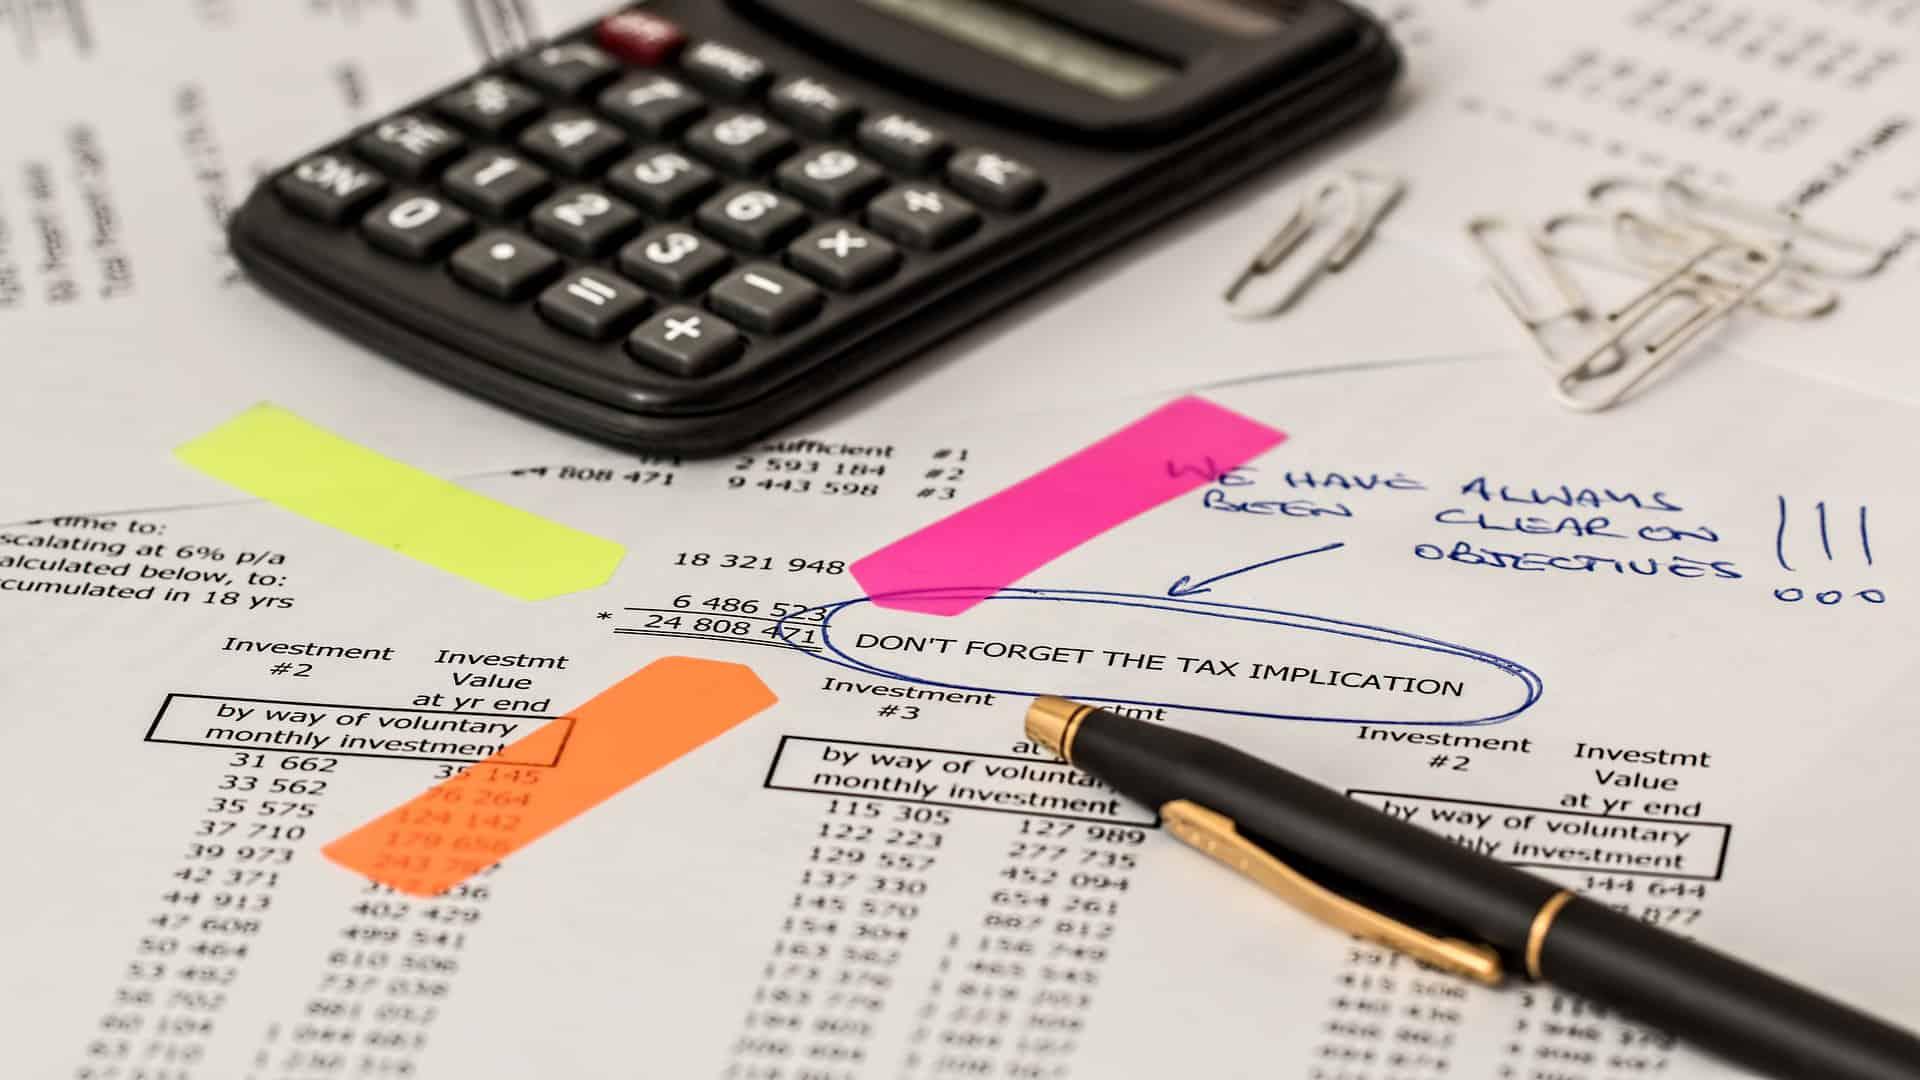 accountable plan irs mileage tracker